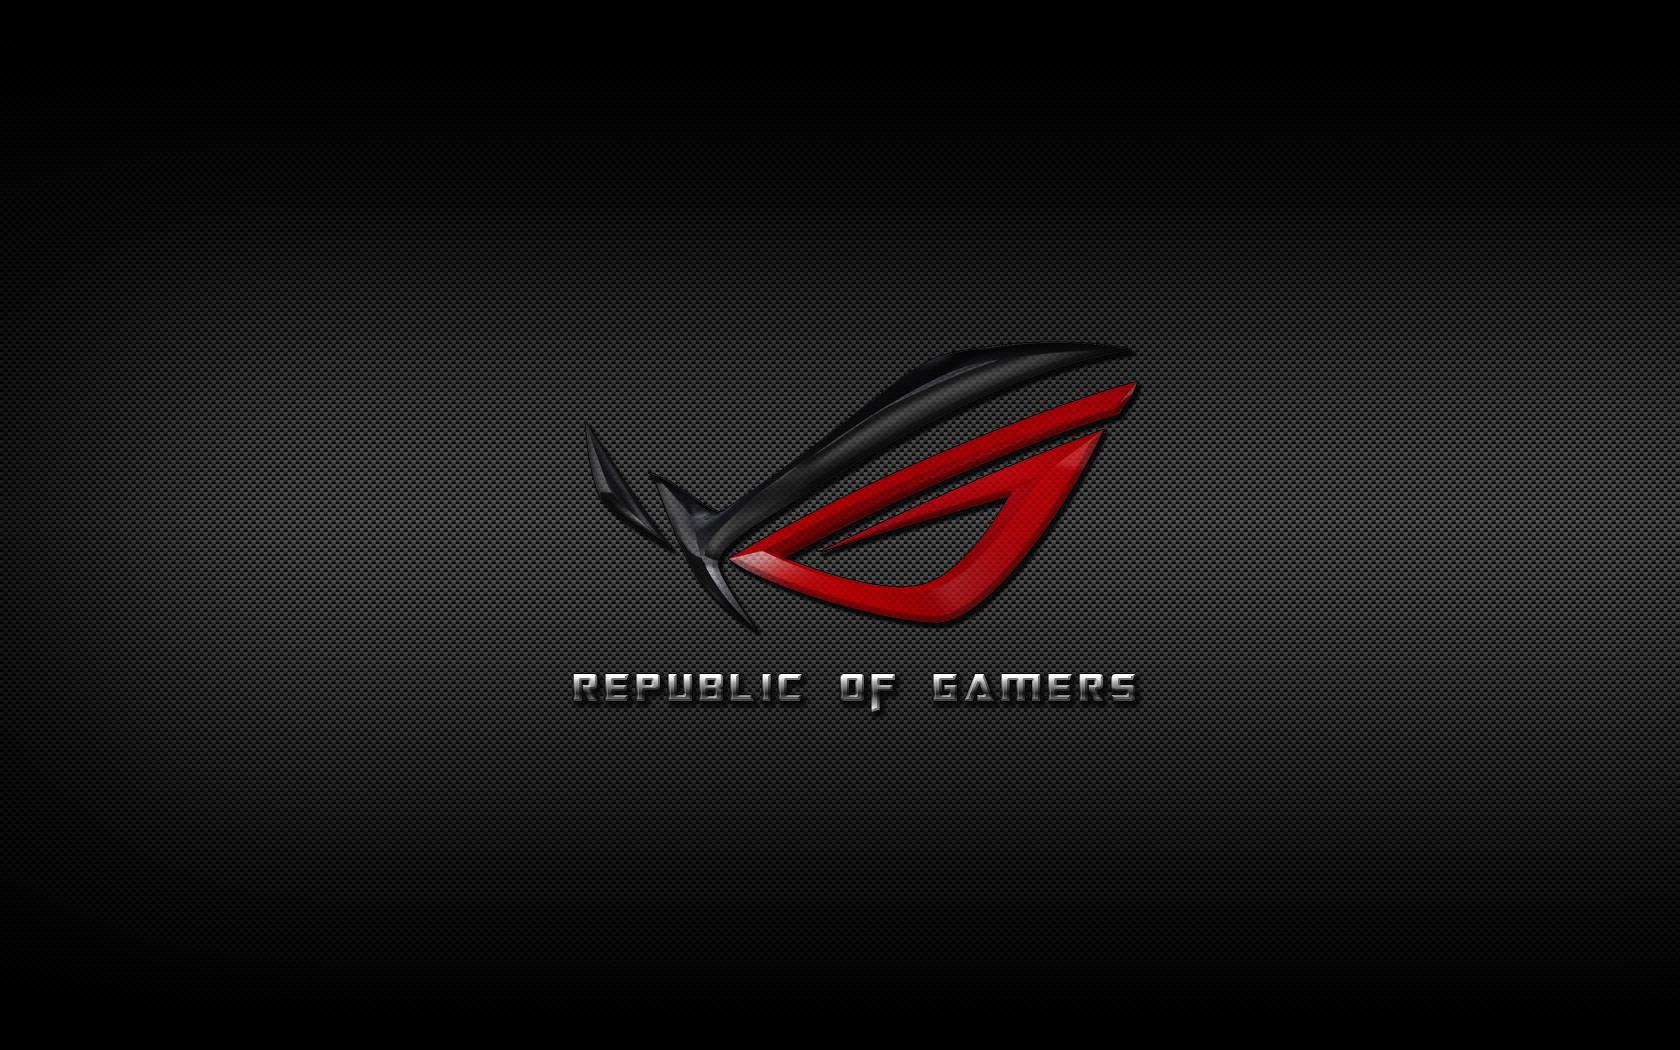 ASUS ROG Republic of Gamers Carbon Fiber by peLu85 1680x1050